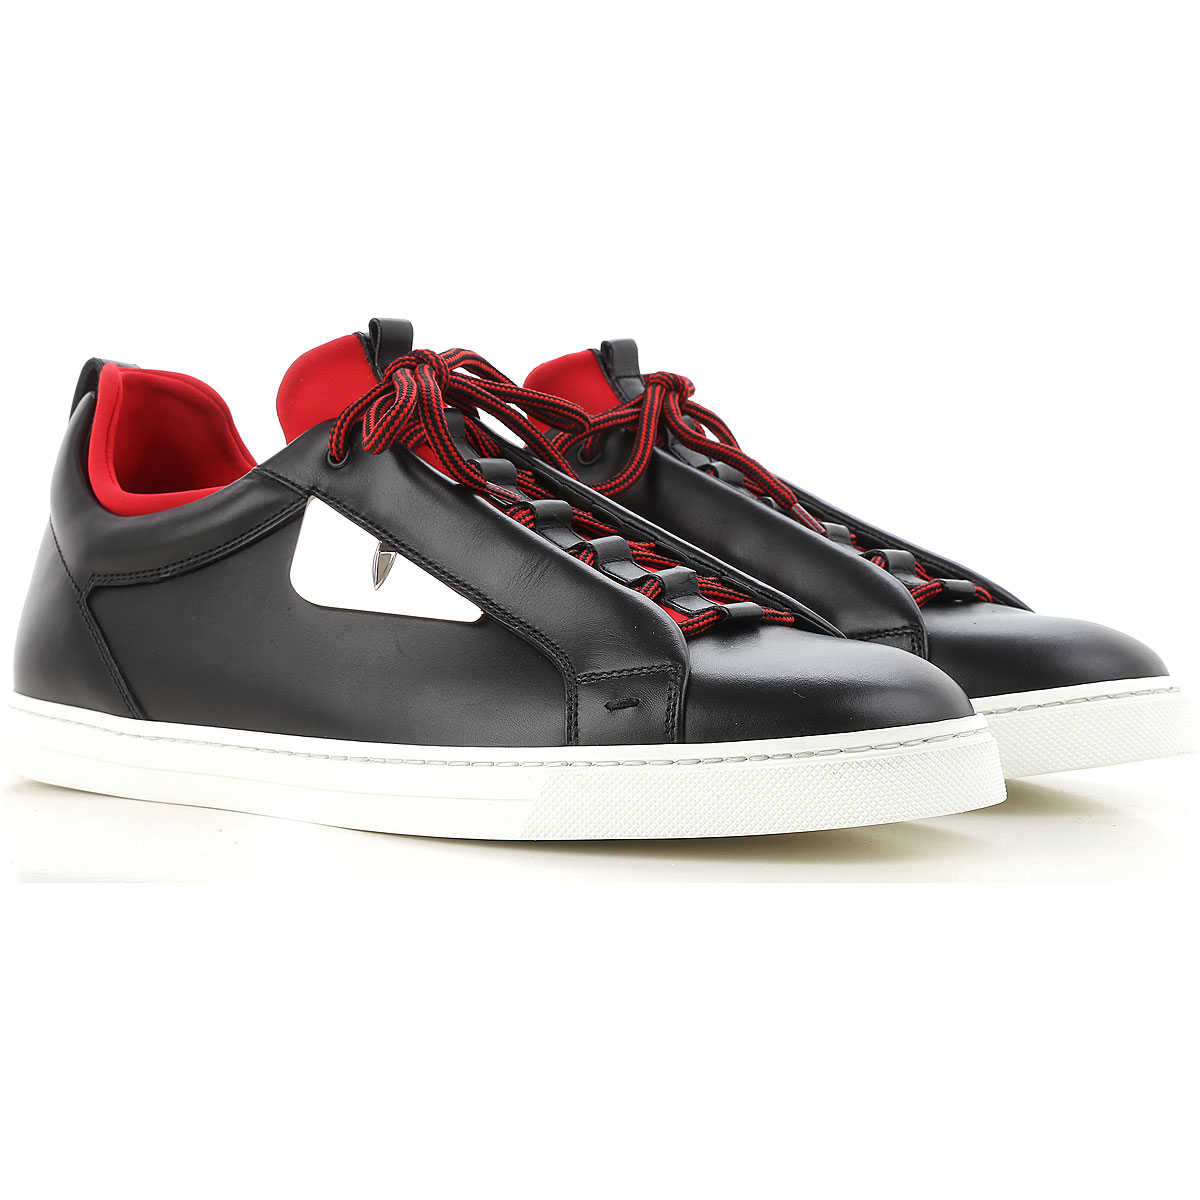 b2d2b6def93e Fendi. Shoes for Men